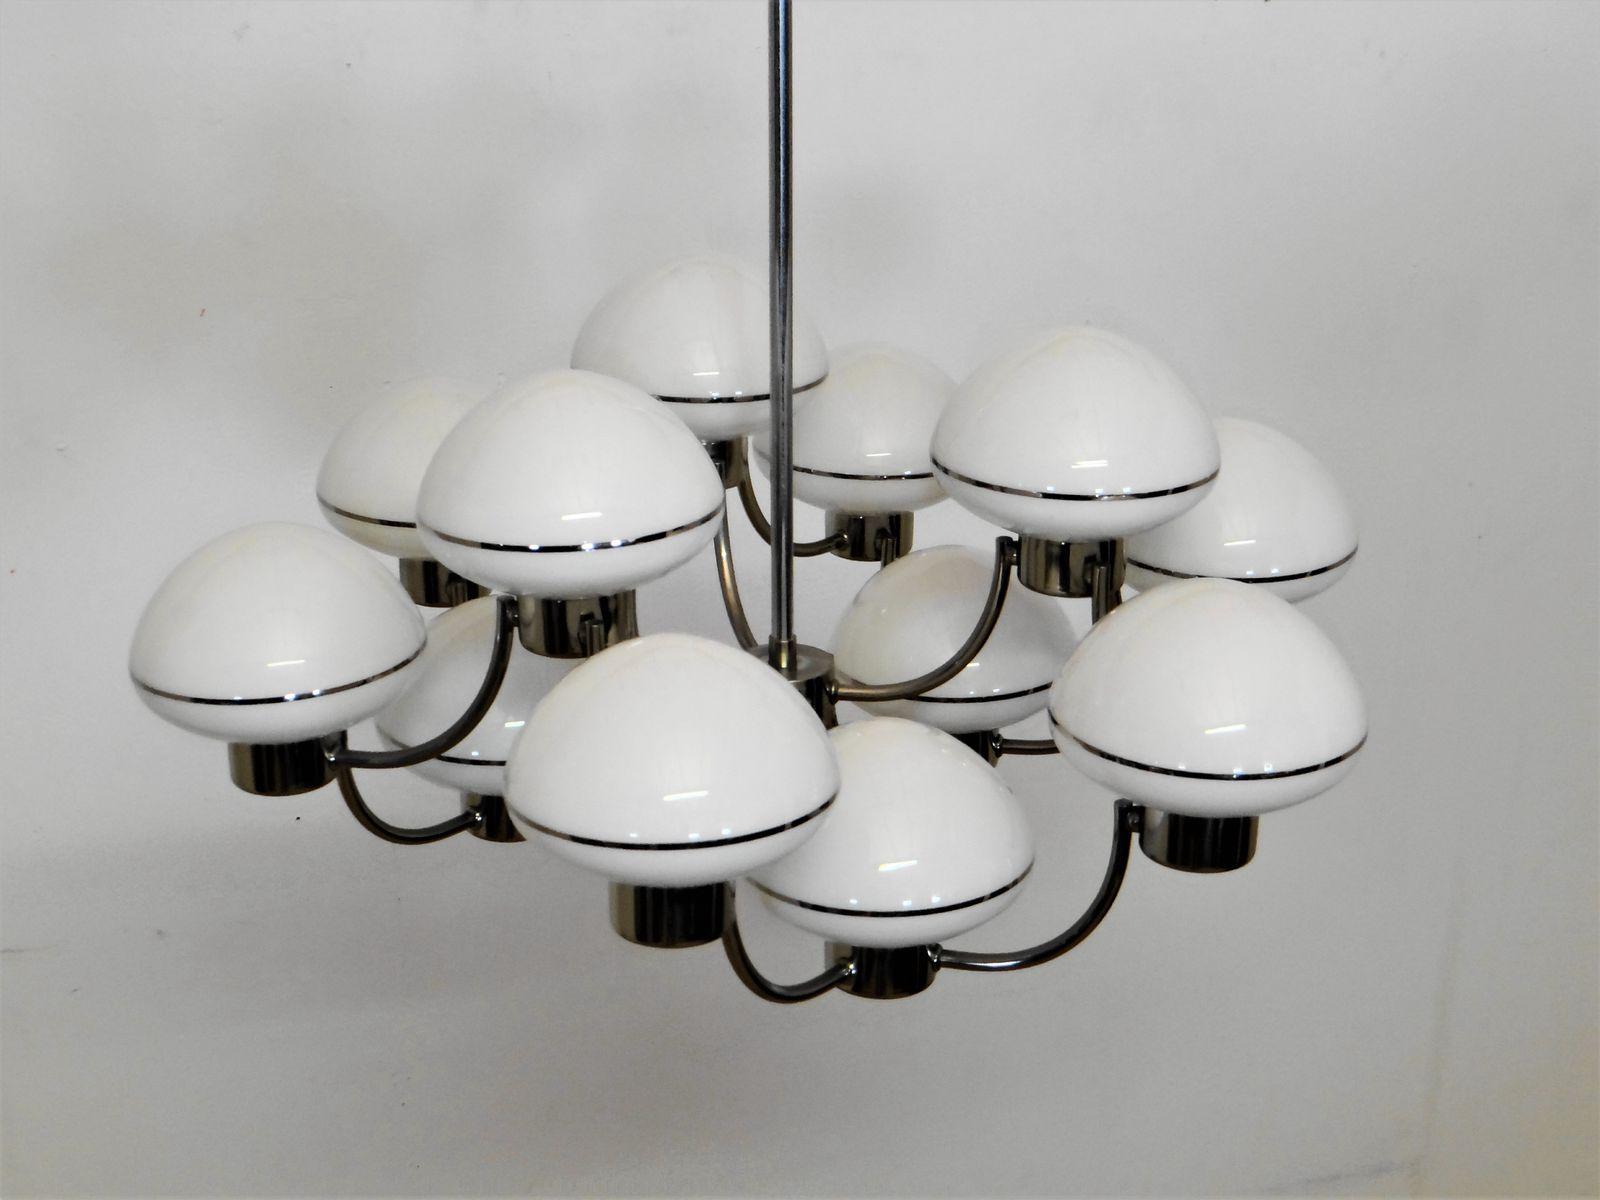 Vintage 12 ball chandelier by gaetano sciolari for sale at pamono vintage 12 ball chandelier by gaetano sciolari arubaitofo Images